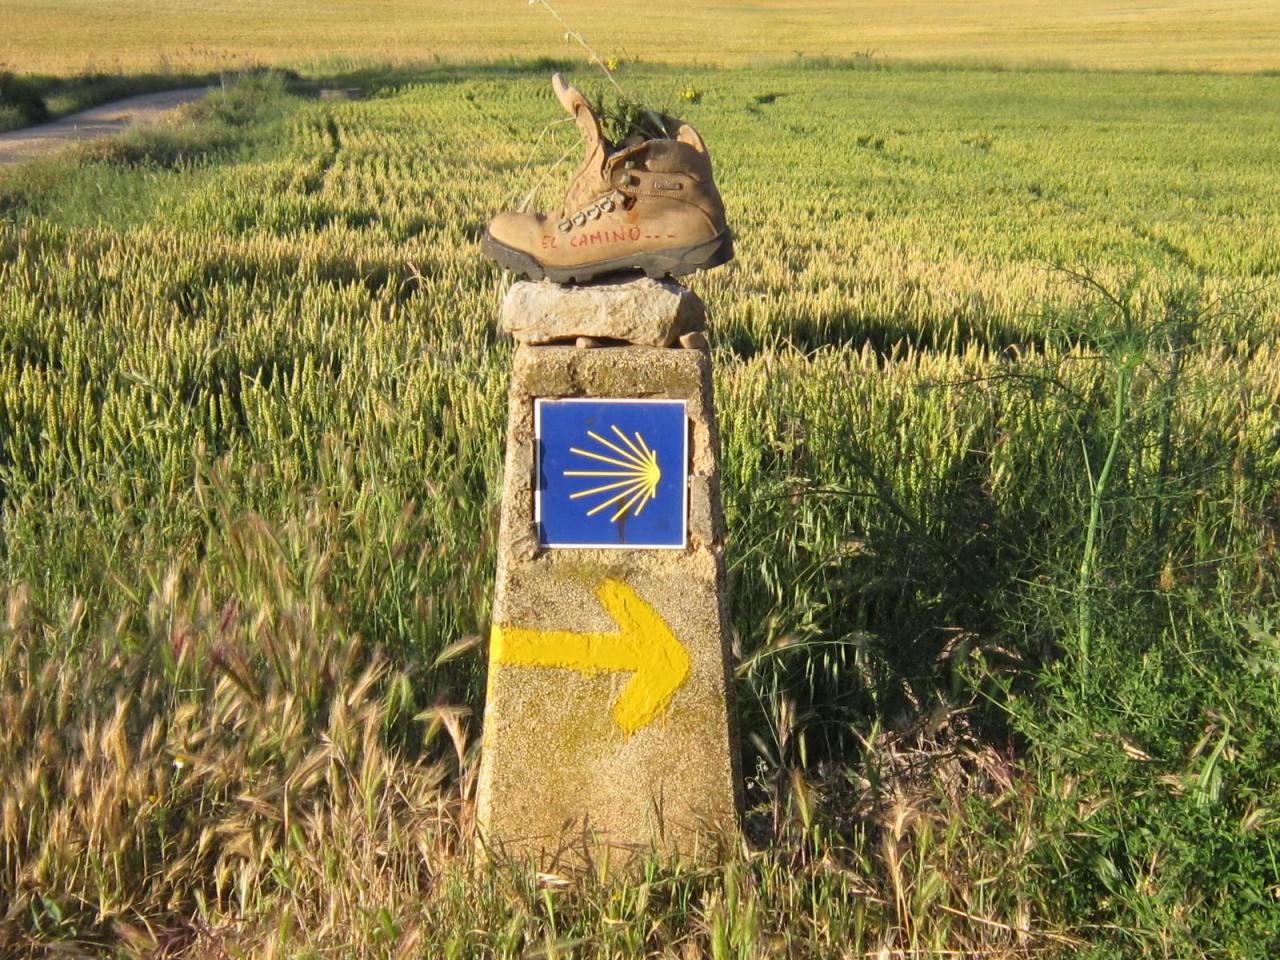 Camino santiago boots